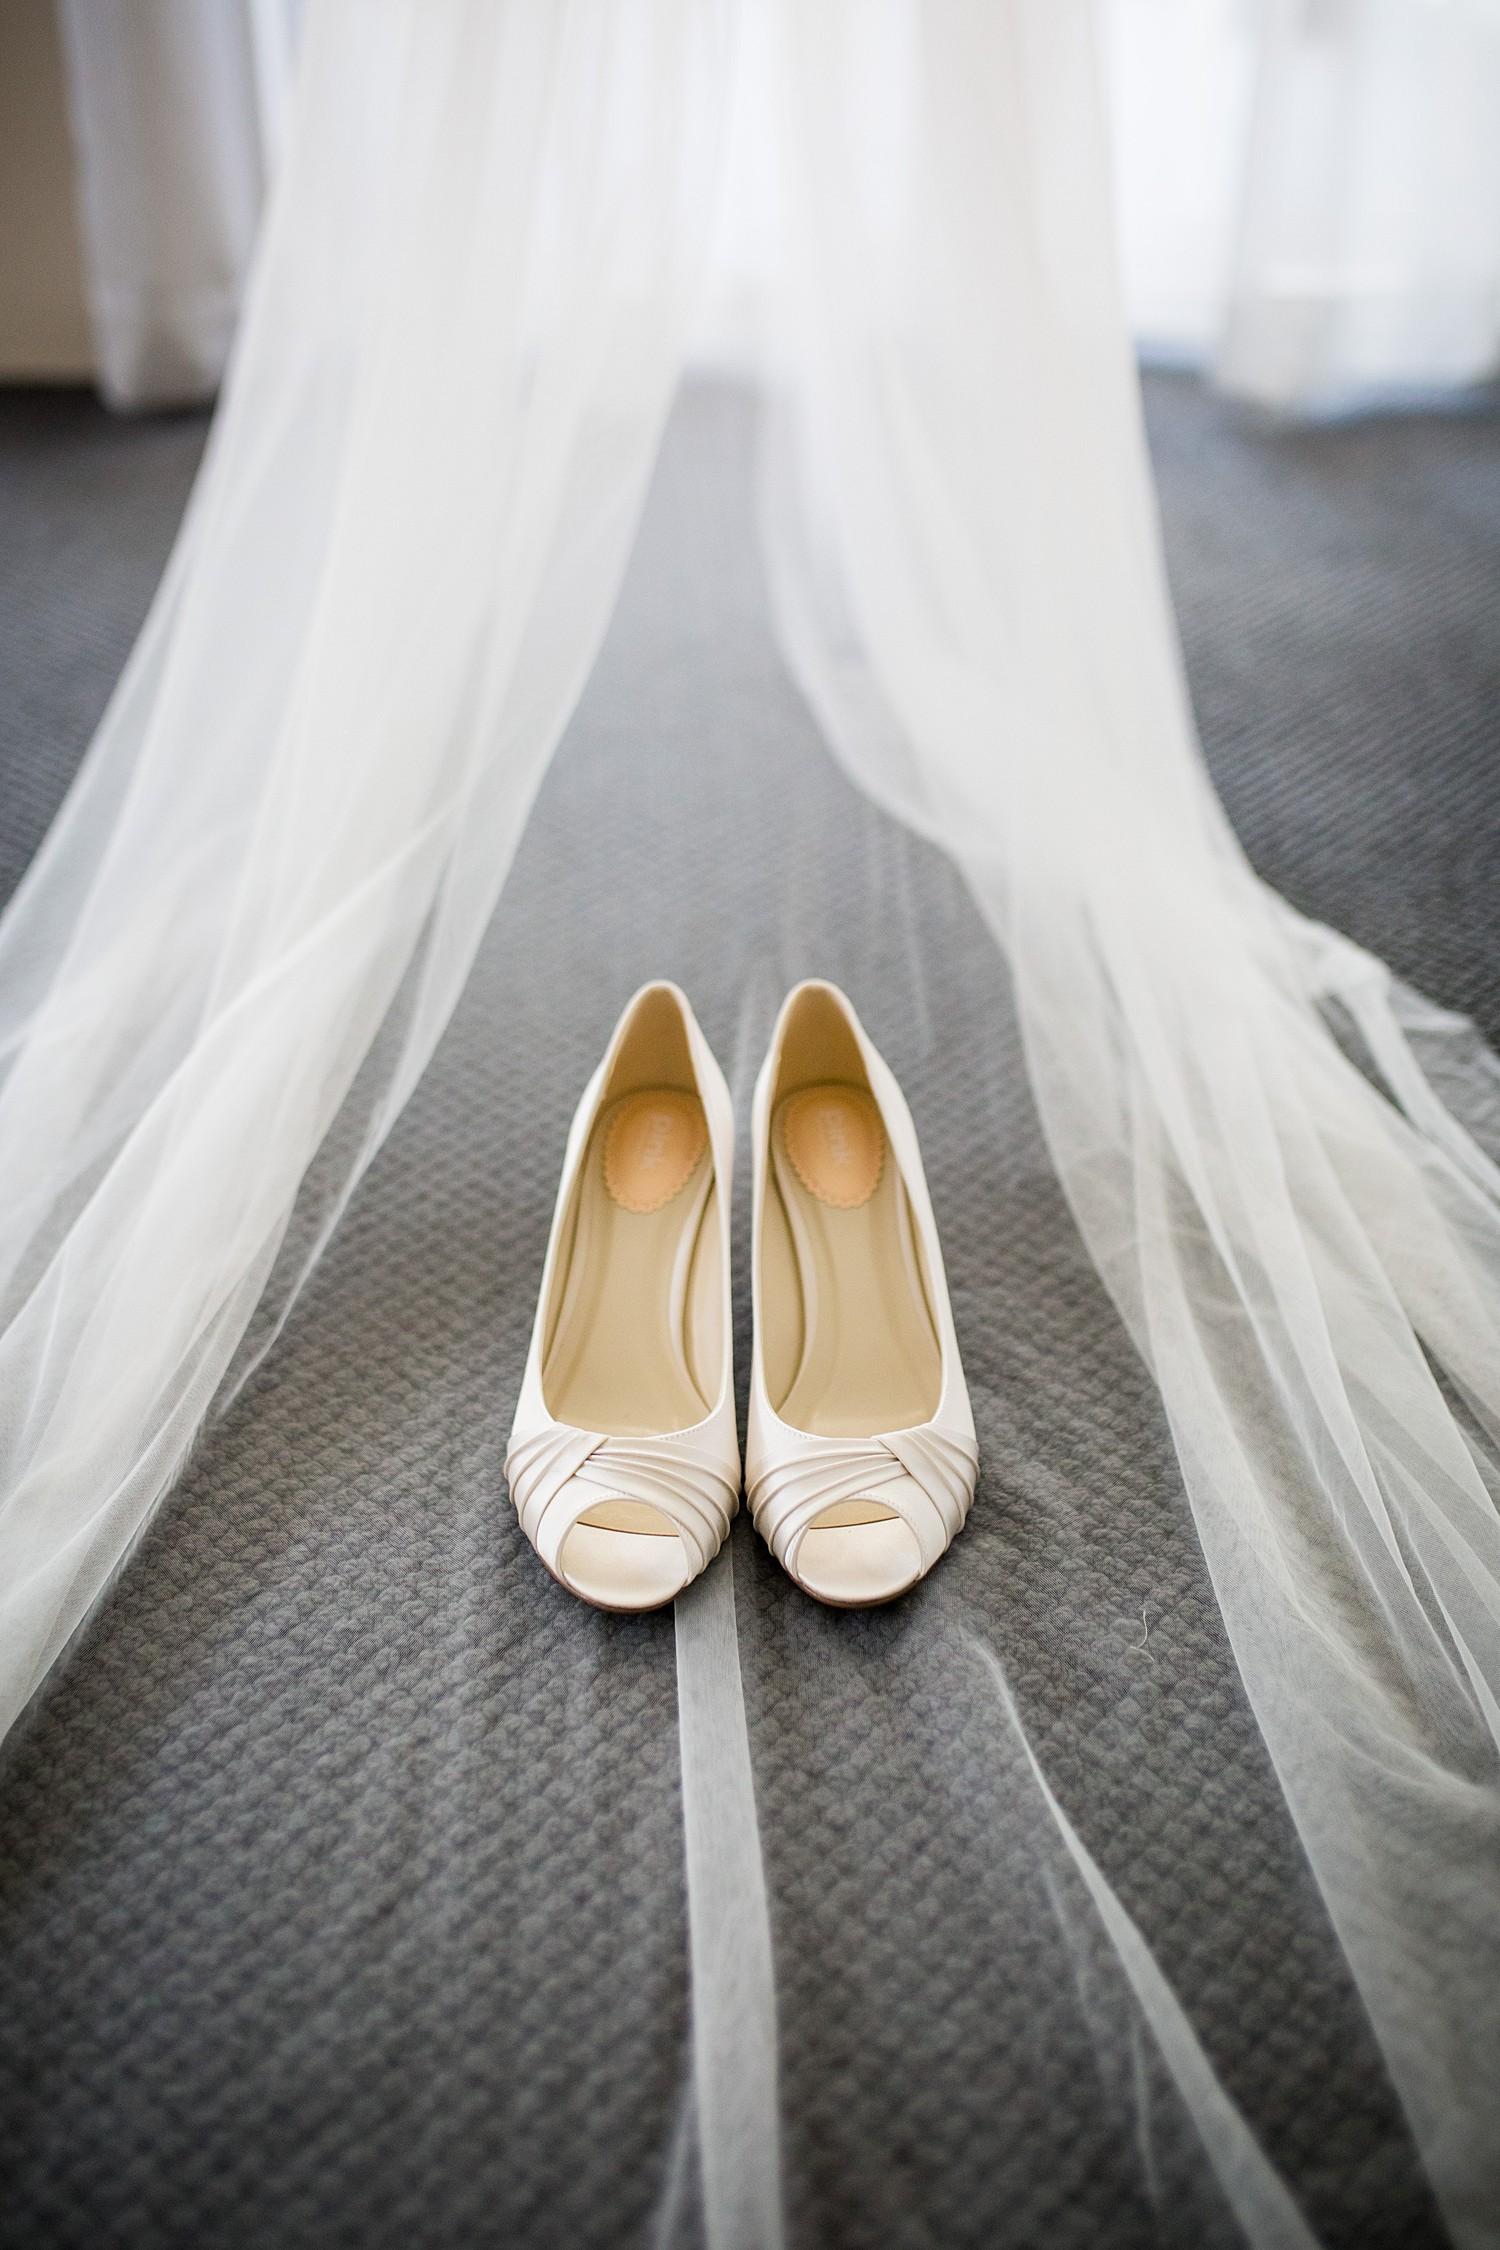 perth_winter_church_wedding_scarborough_rendezvous_0008.jpg